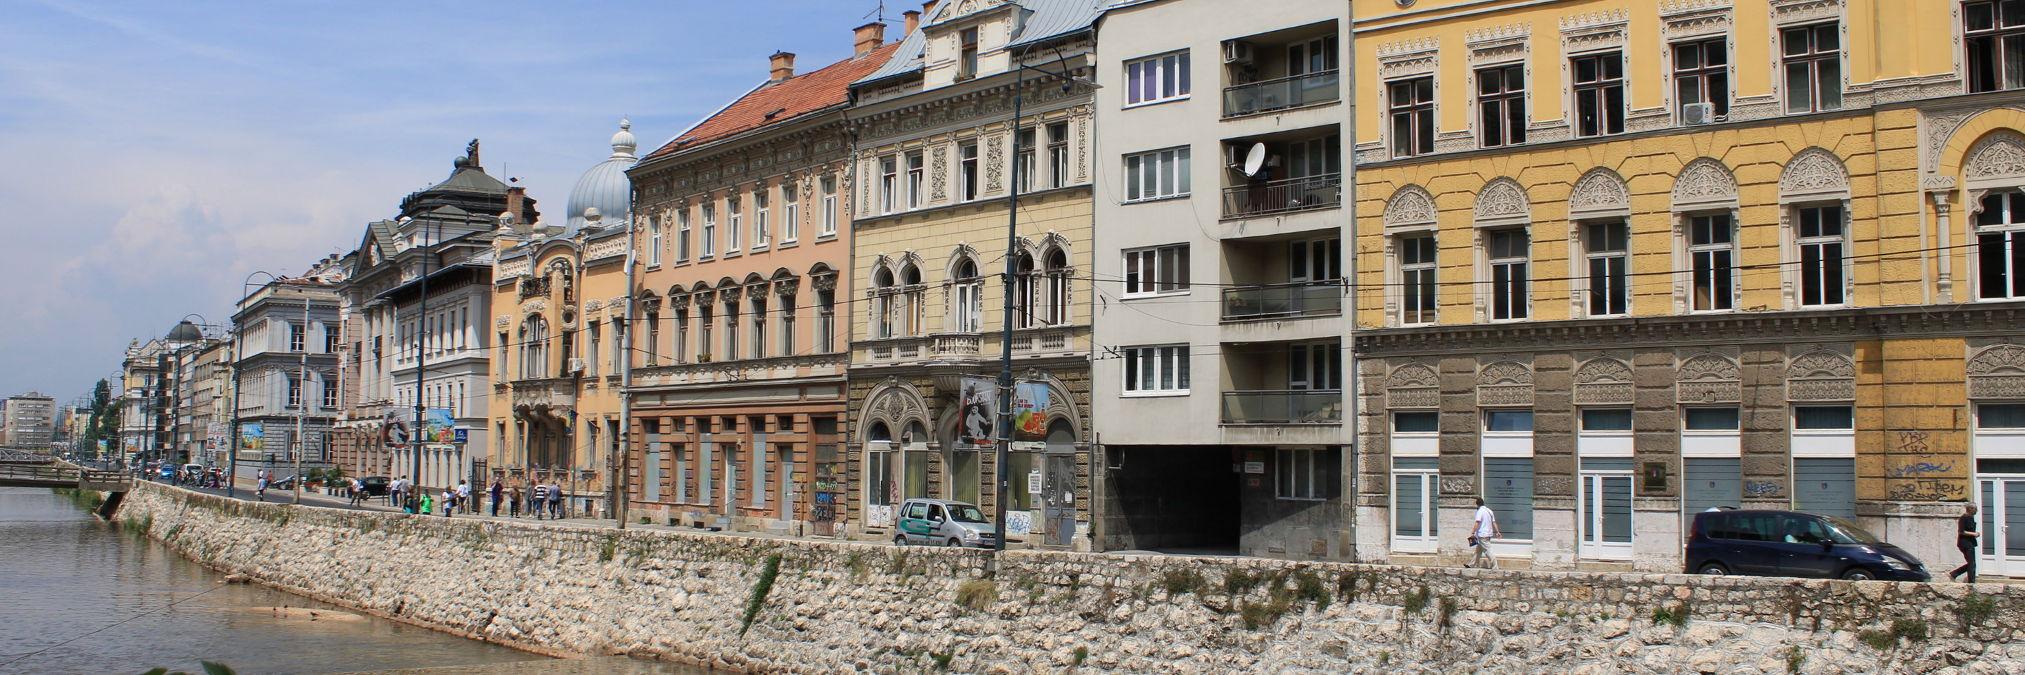 Архитектура Сараева австро-венгерского периода